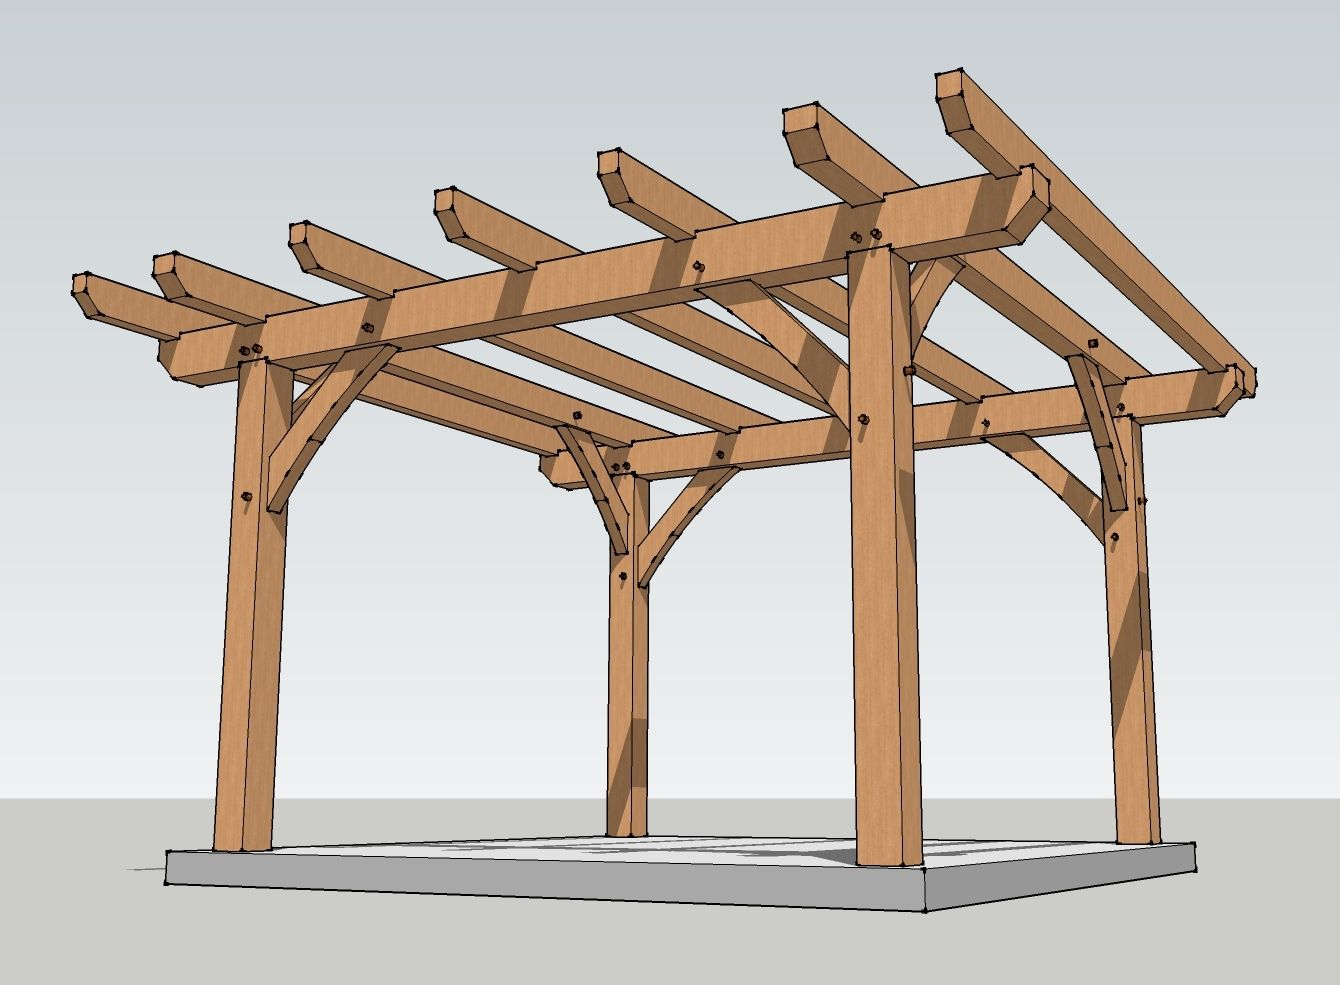 12x12 Timber Frame Pergola Diy Pergola Plans Uk Modern